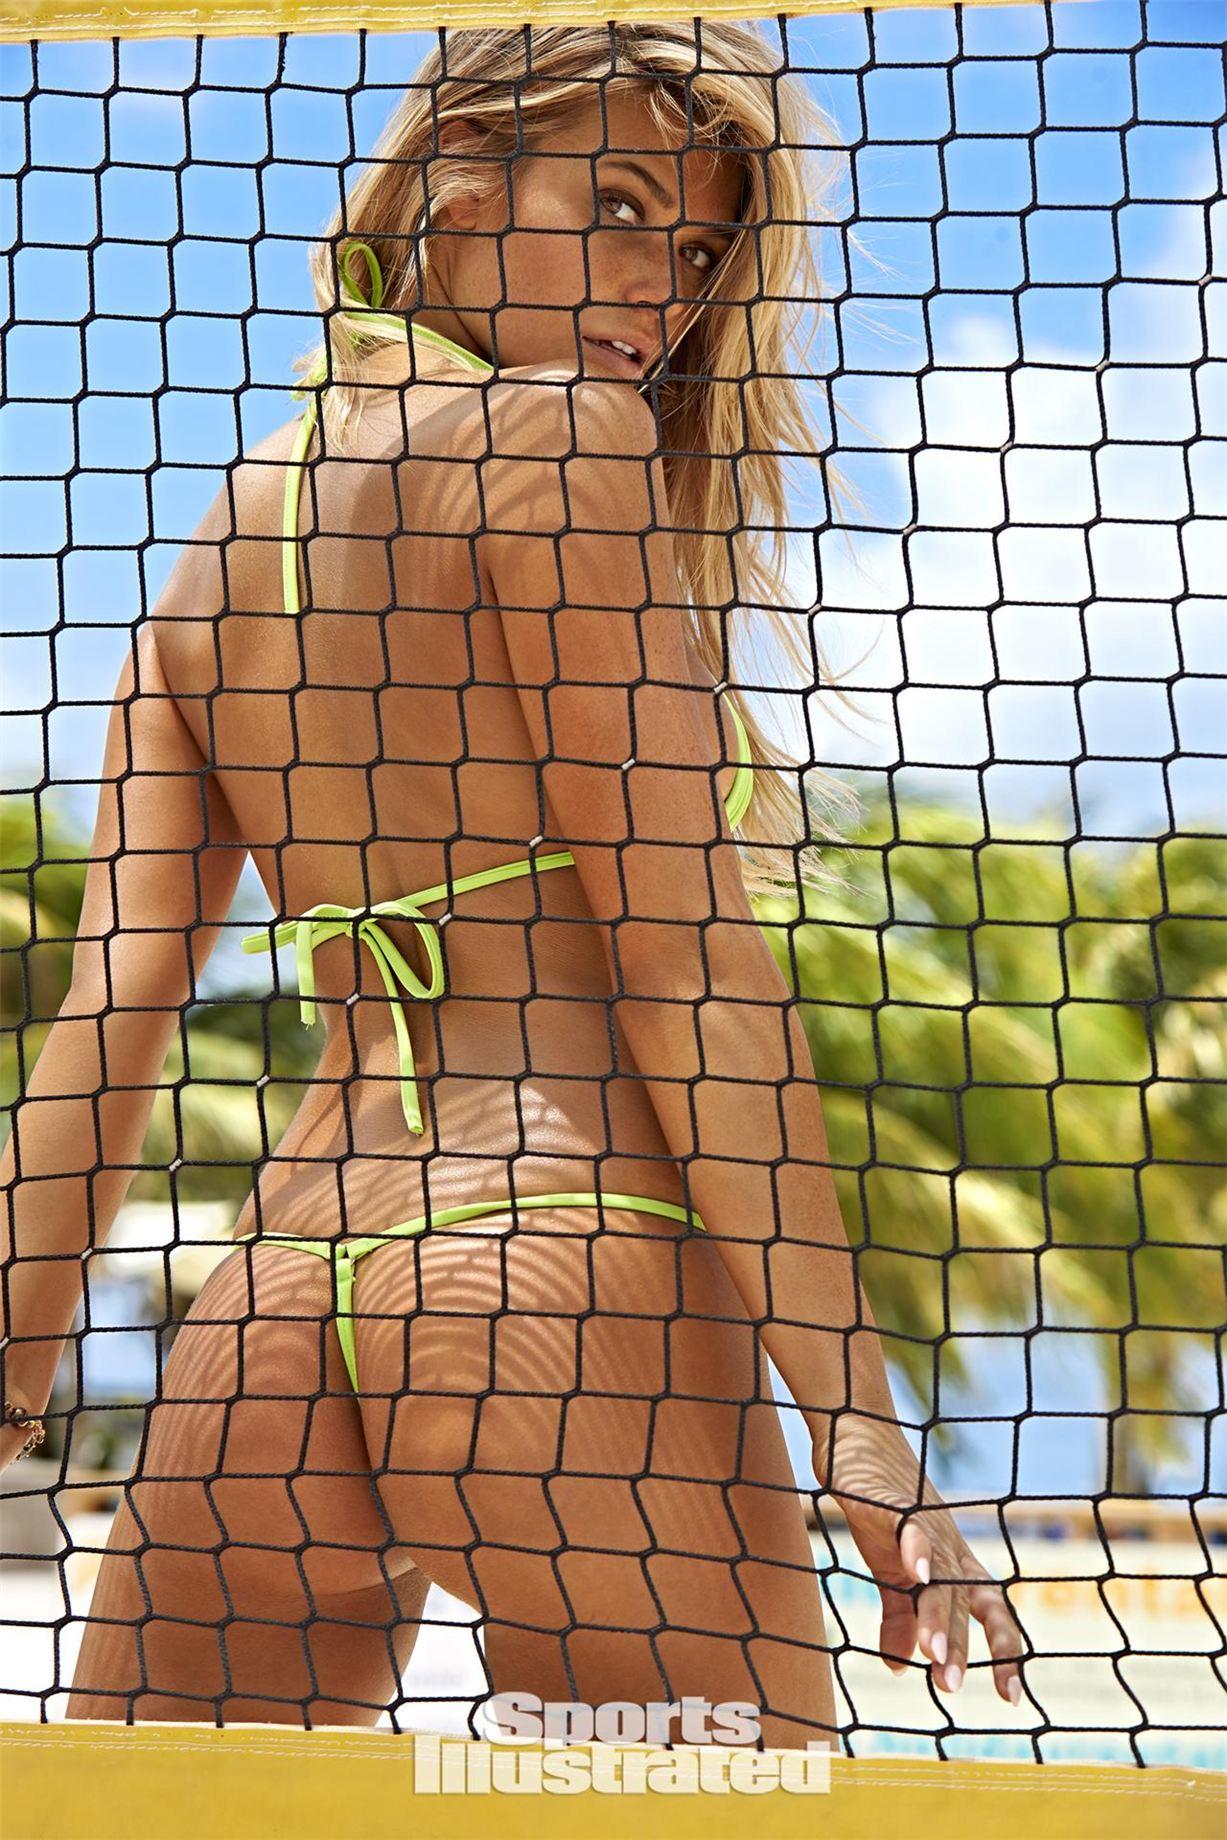 Samantha Hoopes / Саманта Хупс в купальниках из новой коллекции Sports Illustrated Swimsuit 2017 issue / in Curacao by Ben Watts